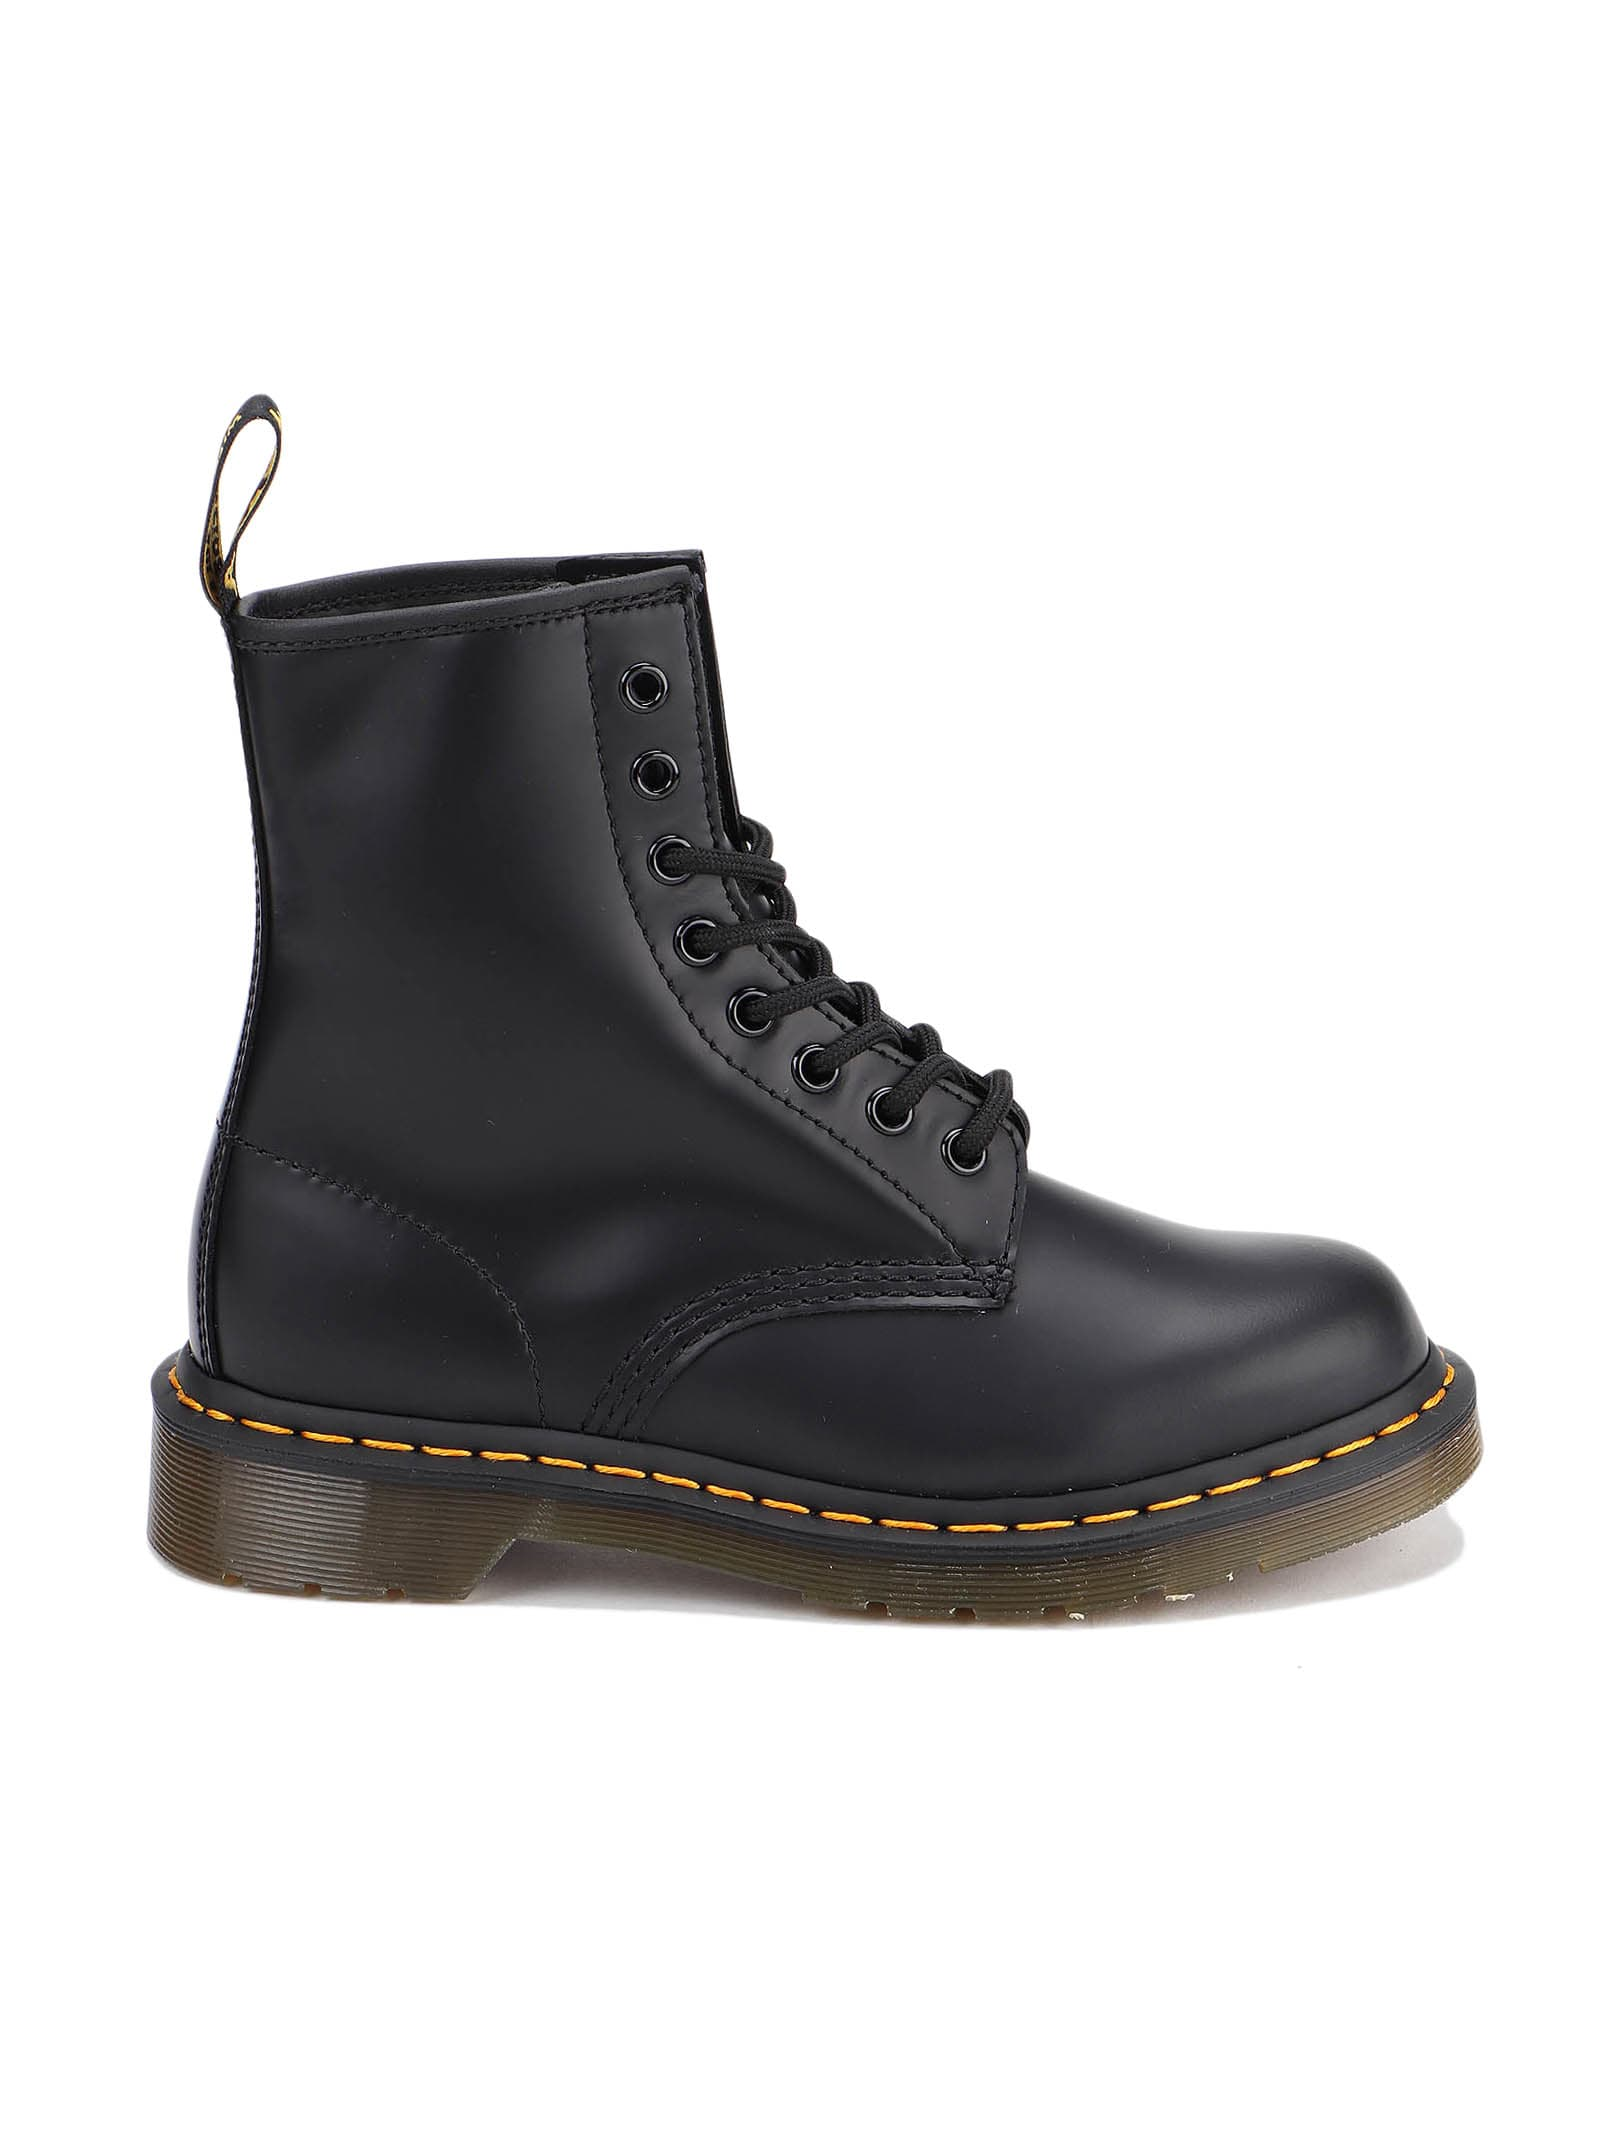 Dr. Martens 1460 Smooth Black Boot